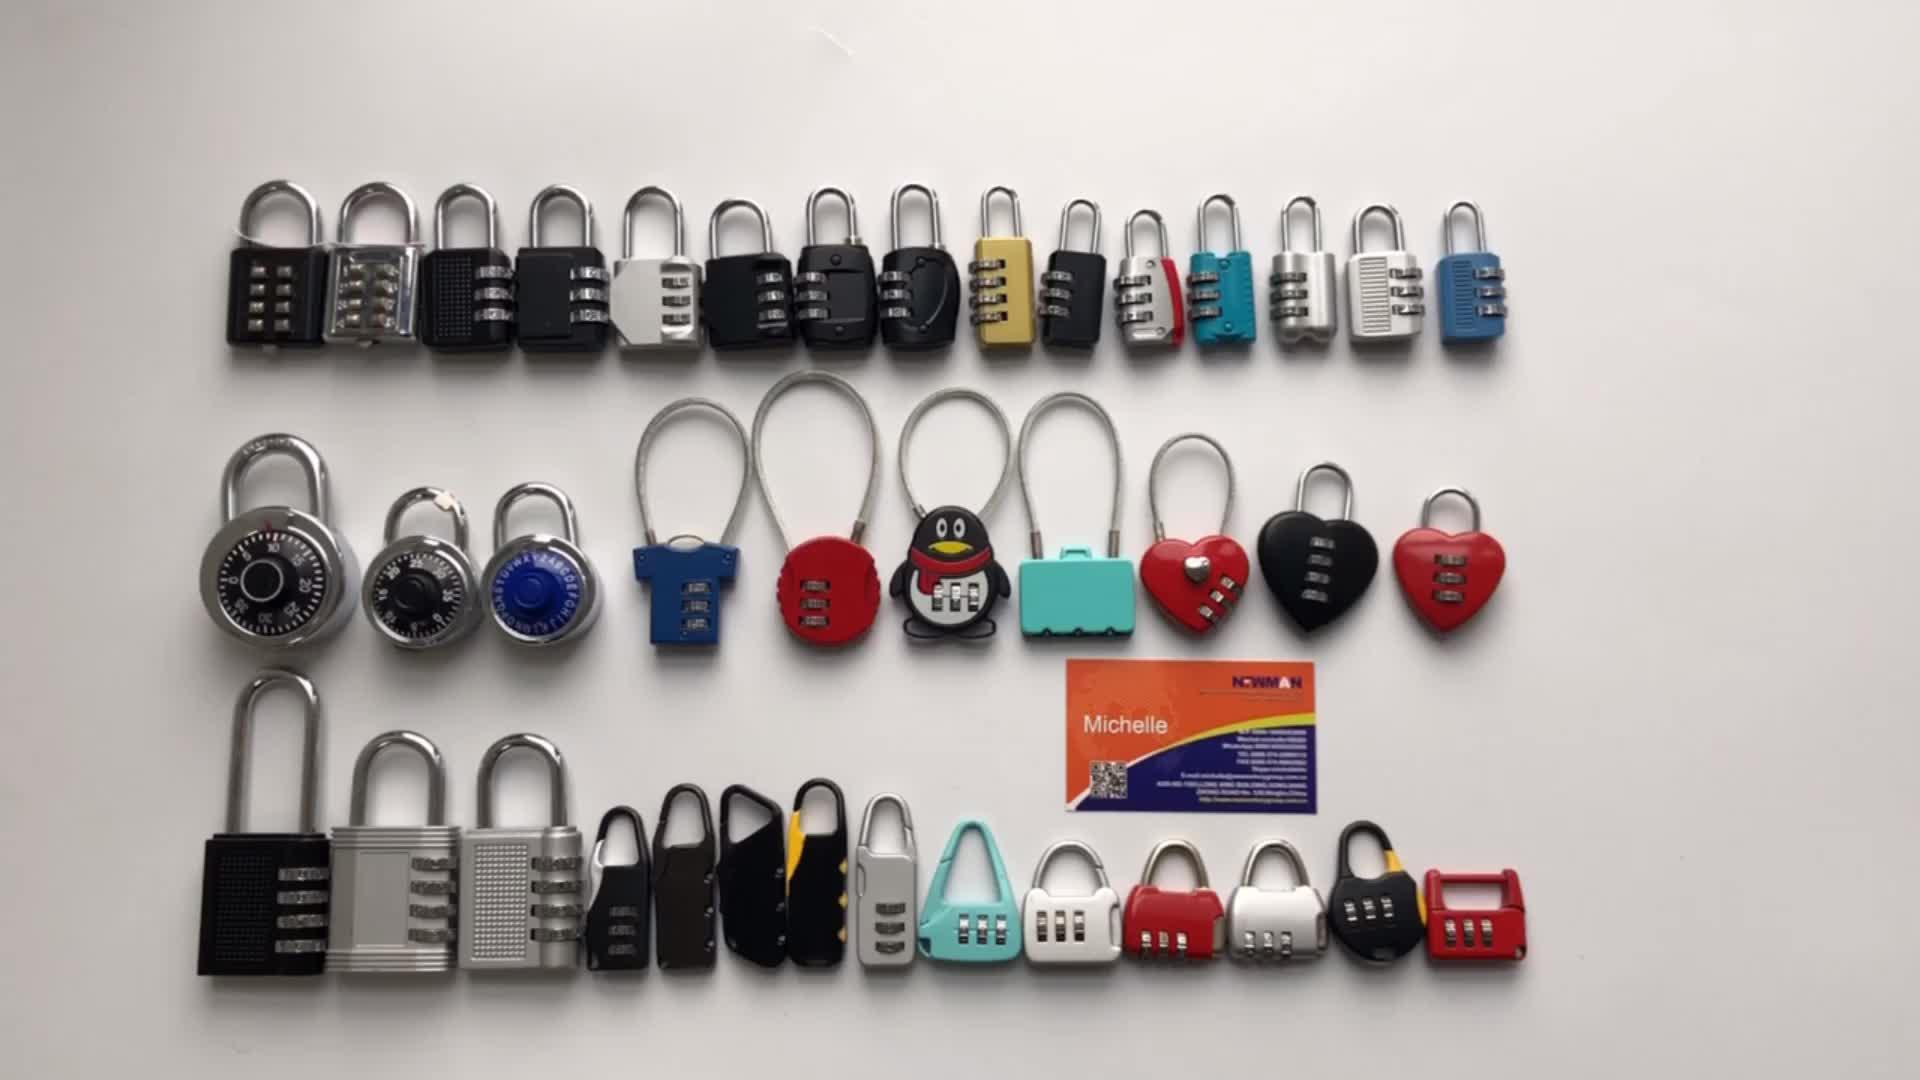 keyless security brass combination padlock,mini rectangular safety brass password lock